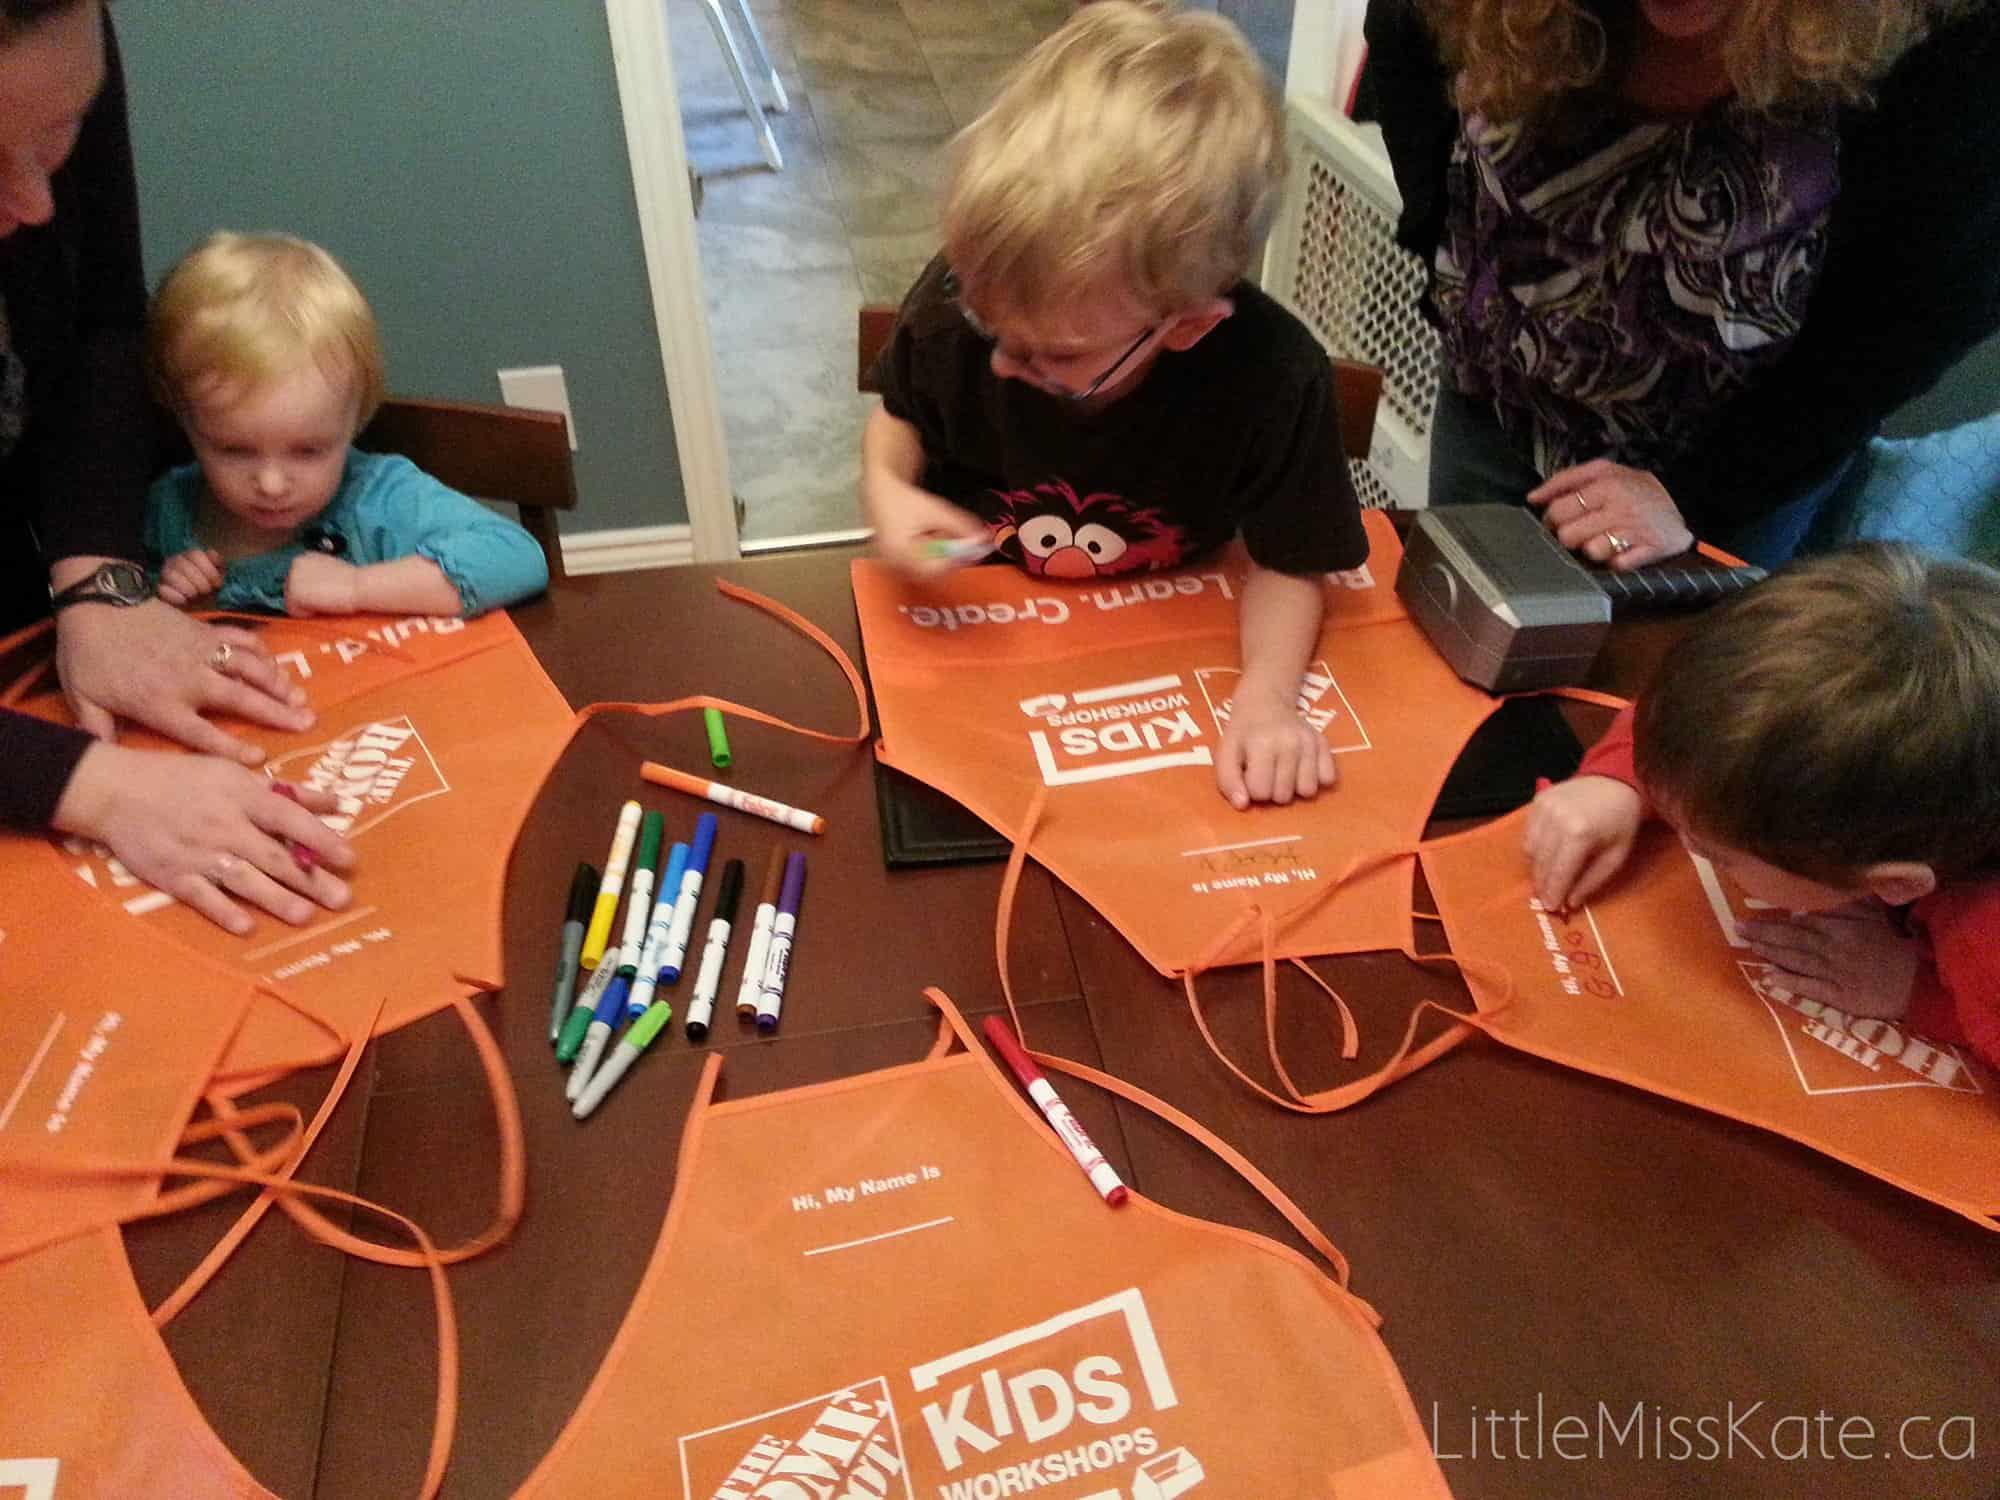 Construction party games activities - decorate construction apron